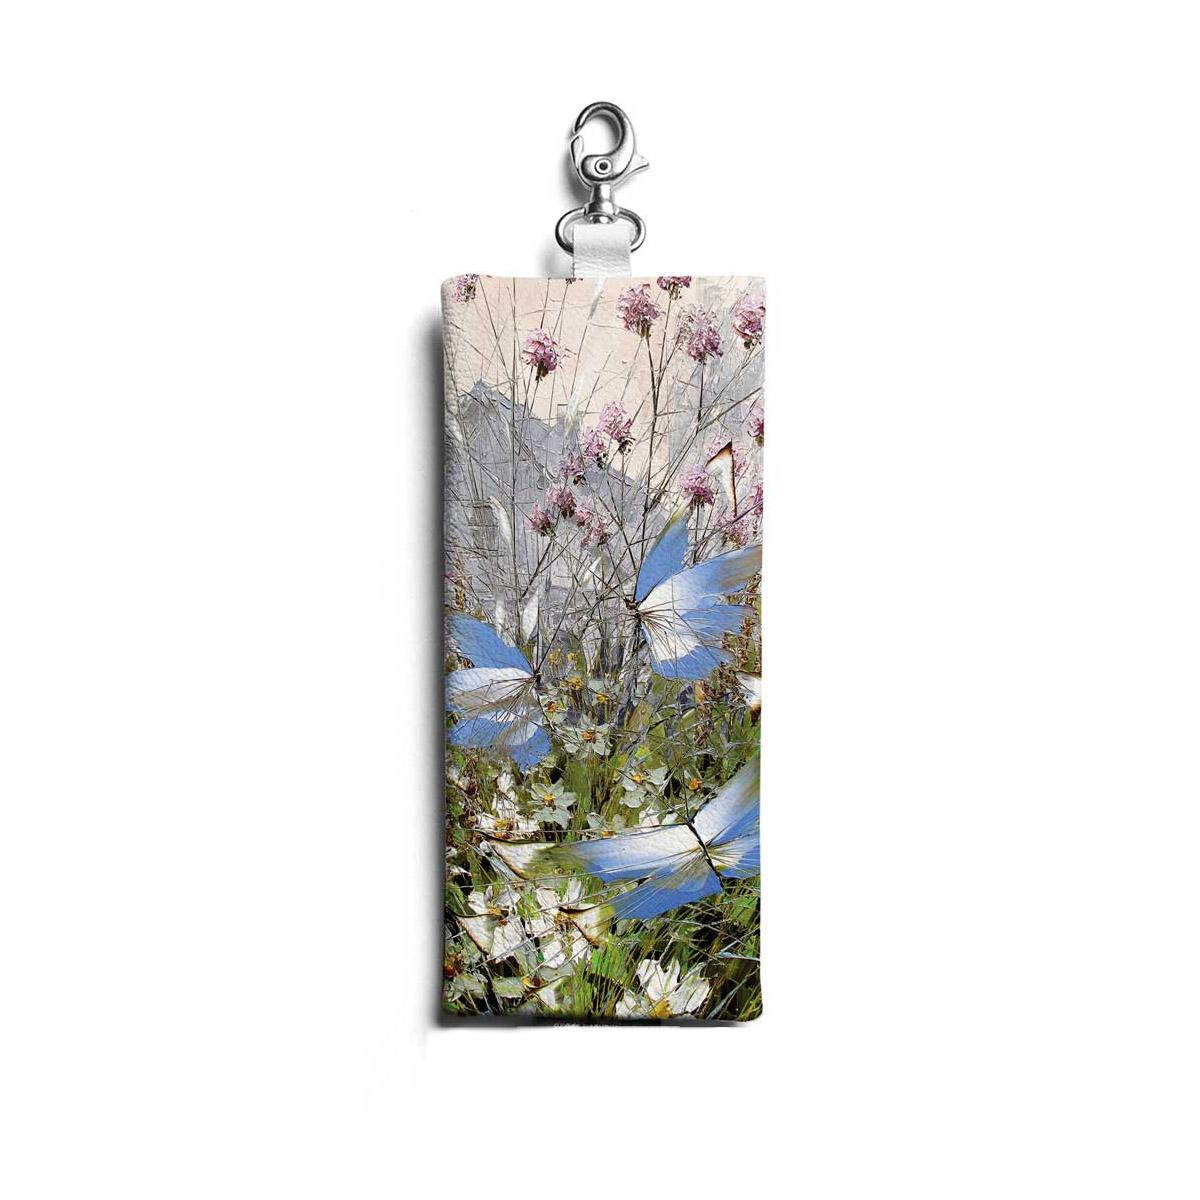 Ключница по картине Дмитрия Кустановича «Бабочки над цветами и травами»